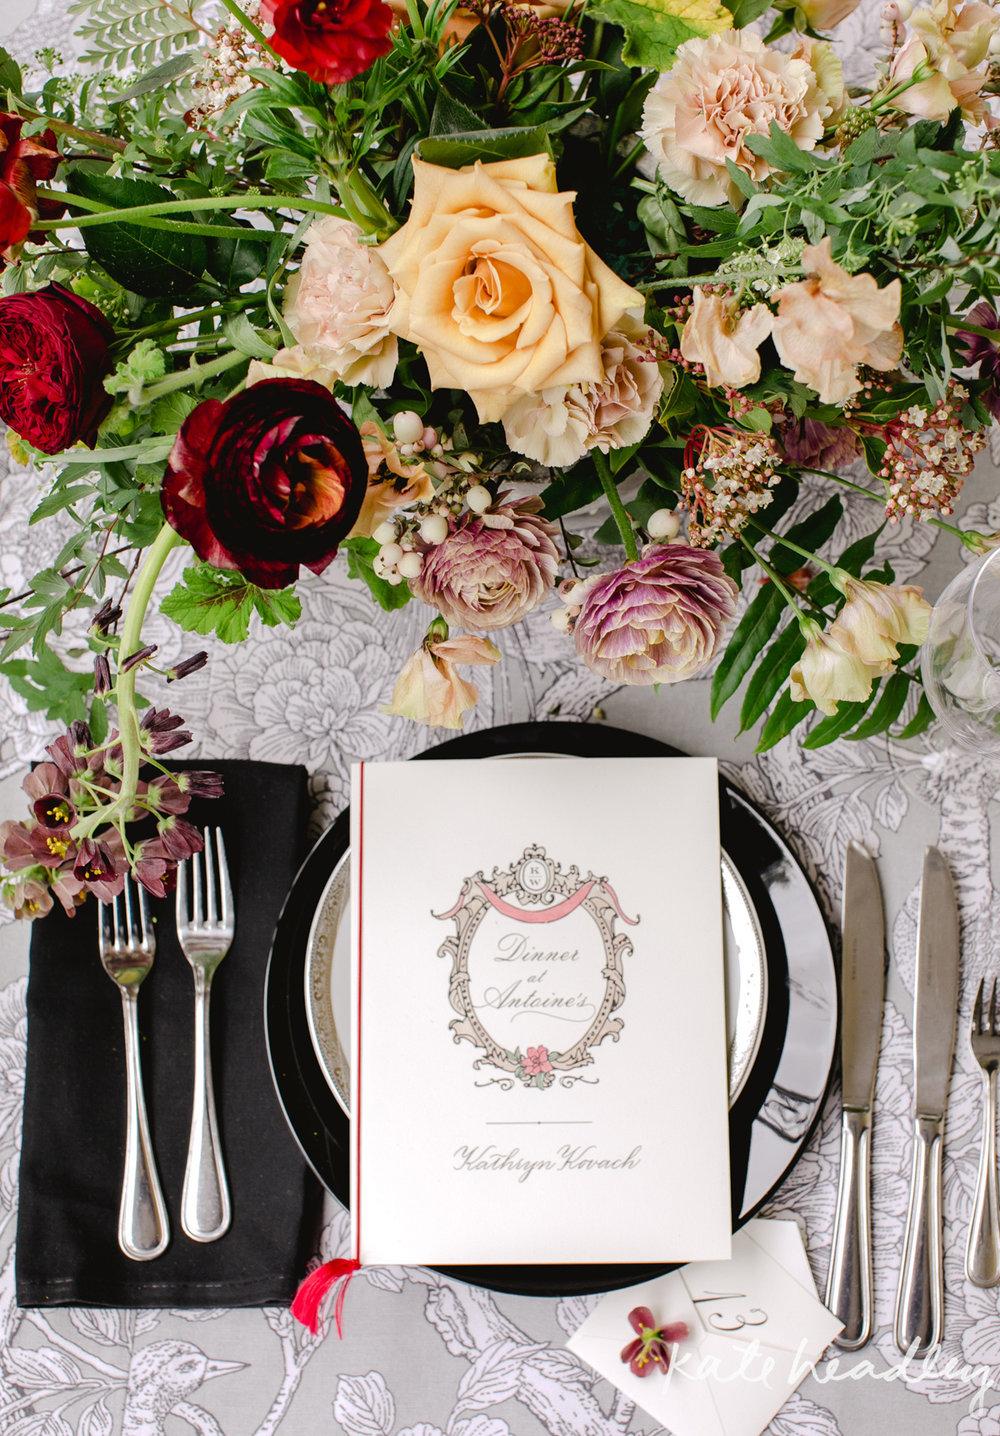 444_KATEHEADLEY_NEW_ORLEANS_WEDDING.jpg